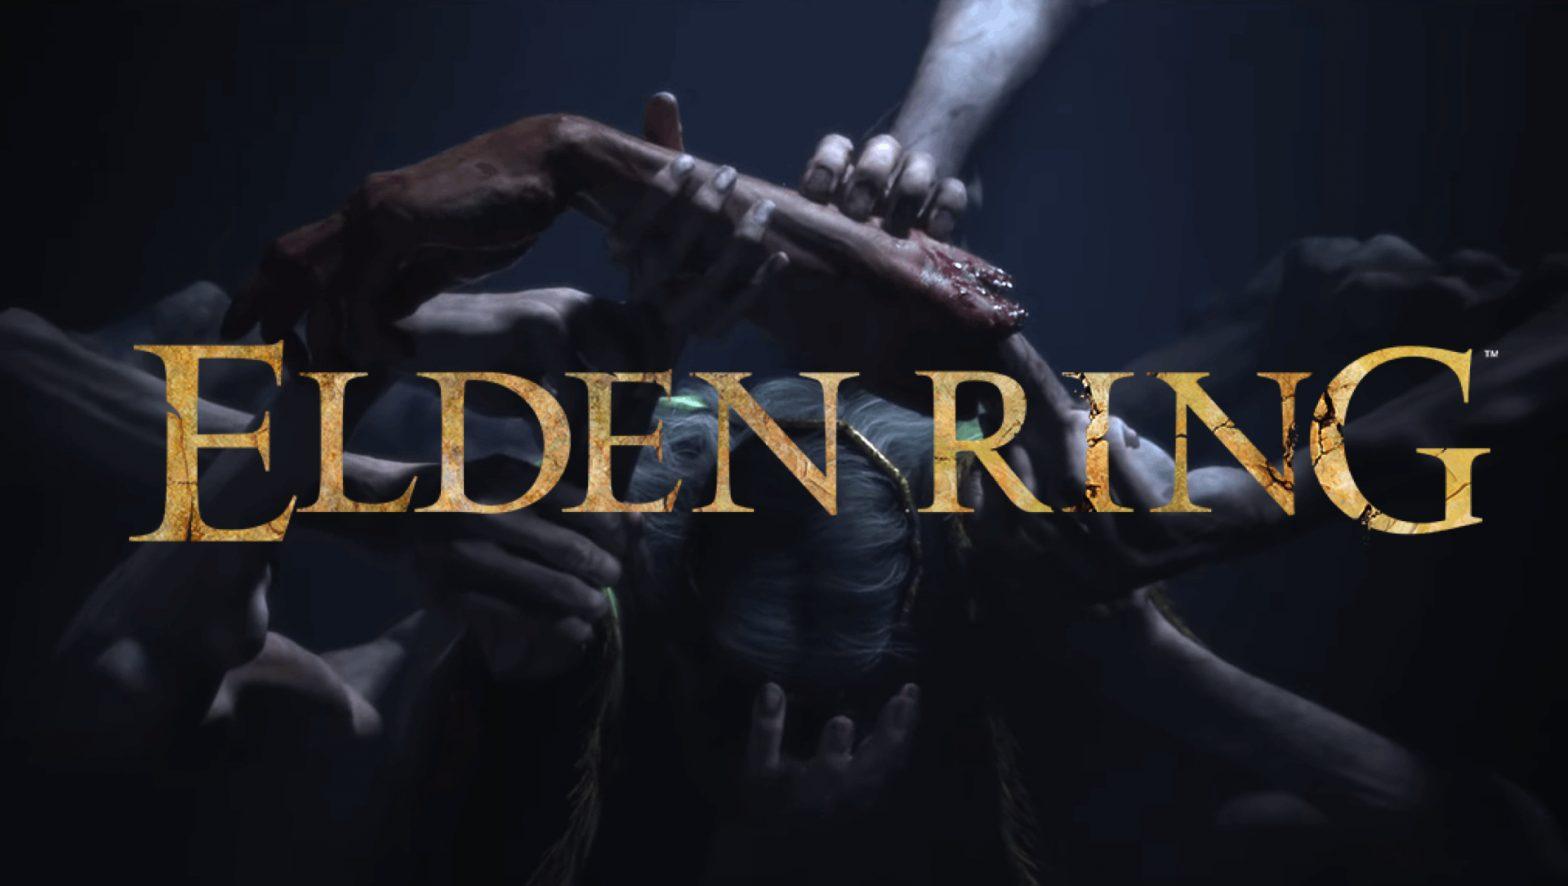 Elden Ring: o que esperamos do novo jogo da FromSoftware